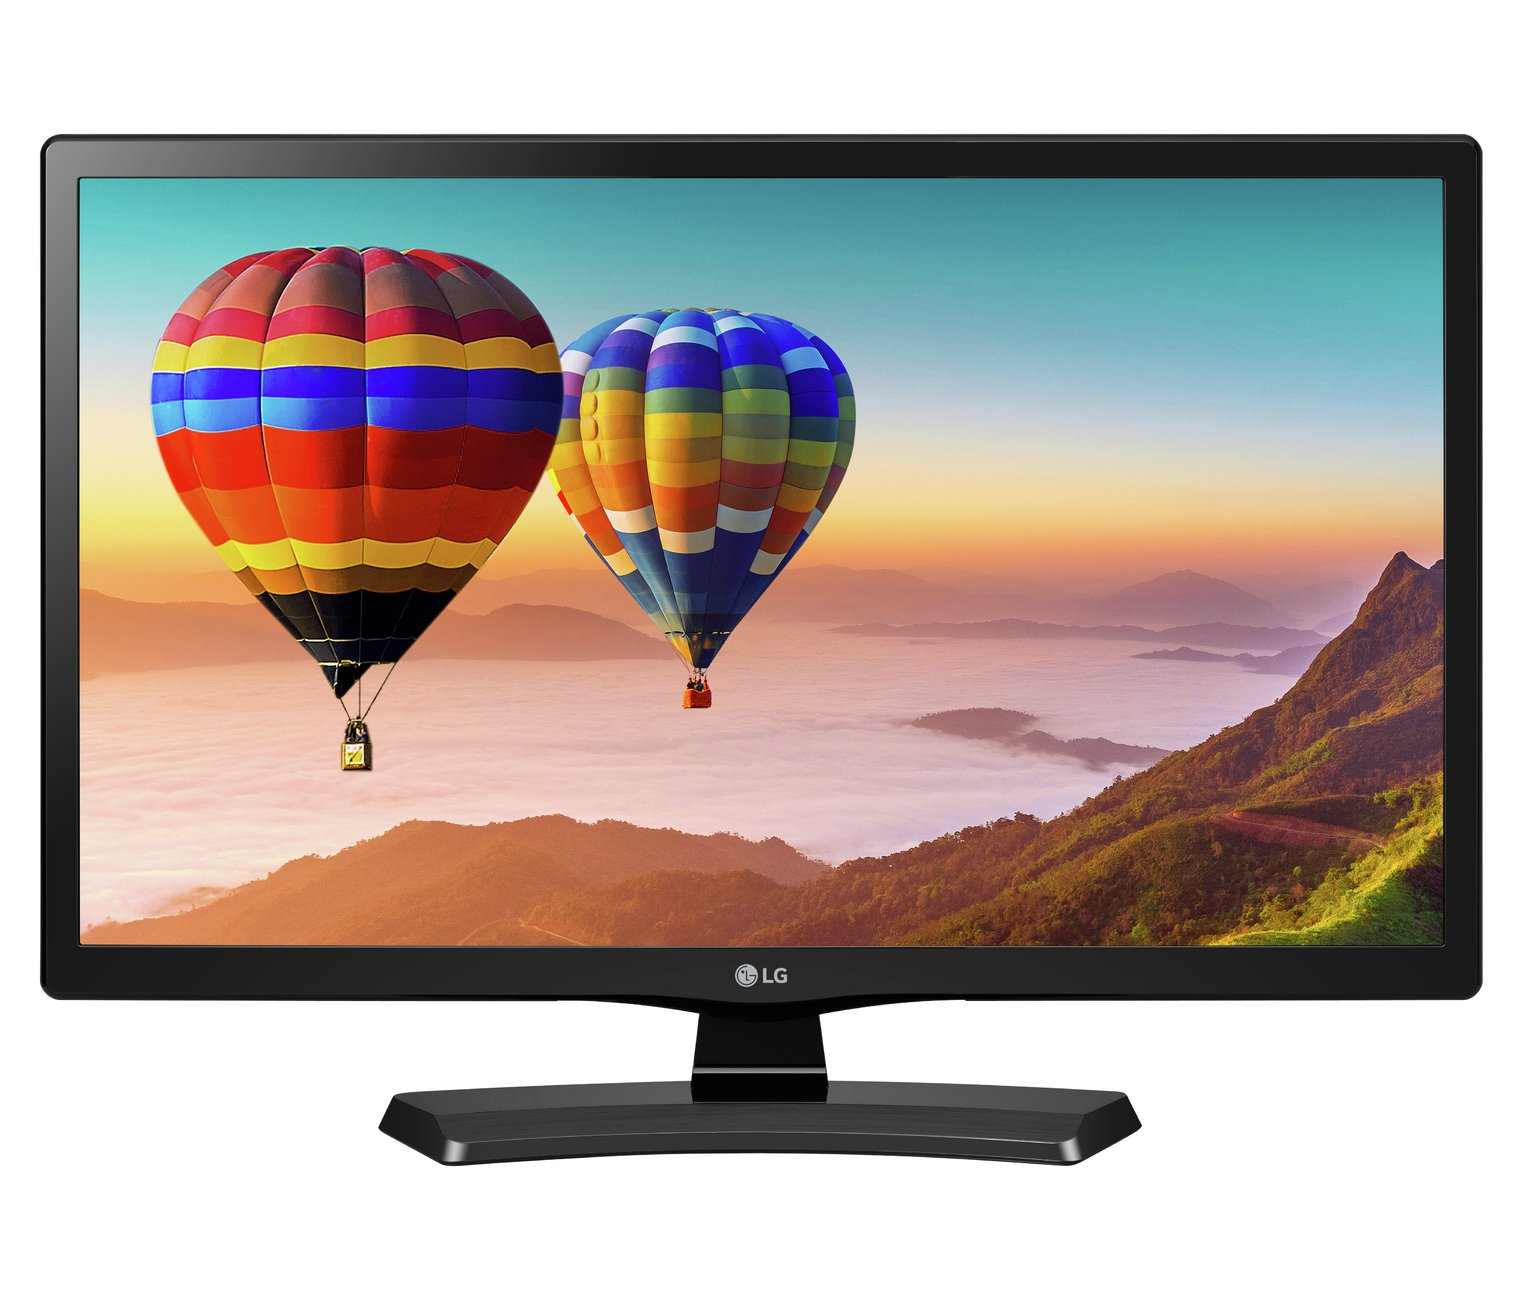 LG 22 Inch 22TN410V Full HD LED TV Monitor